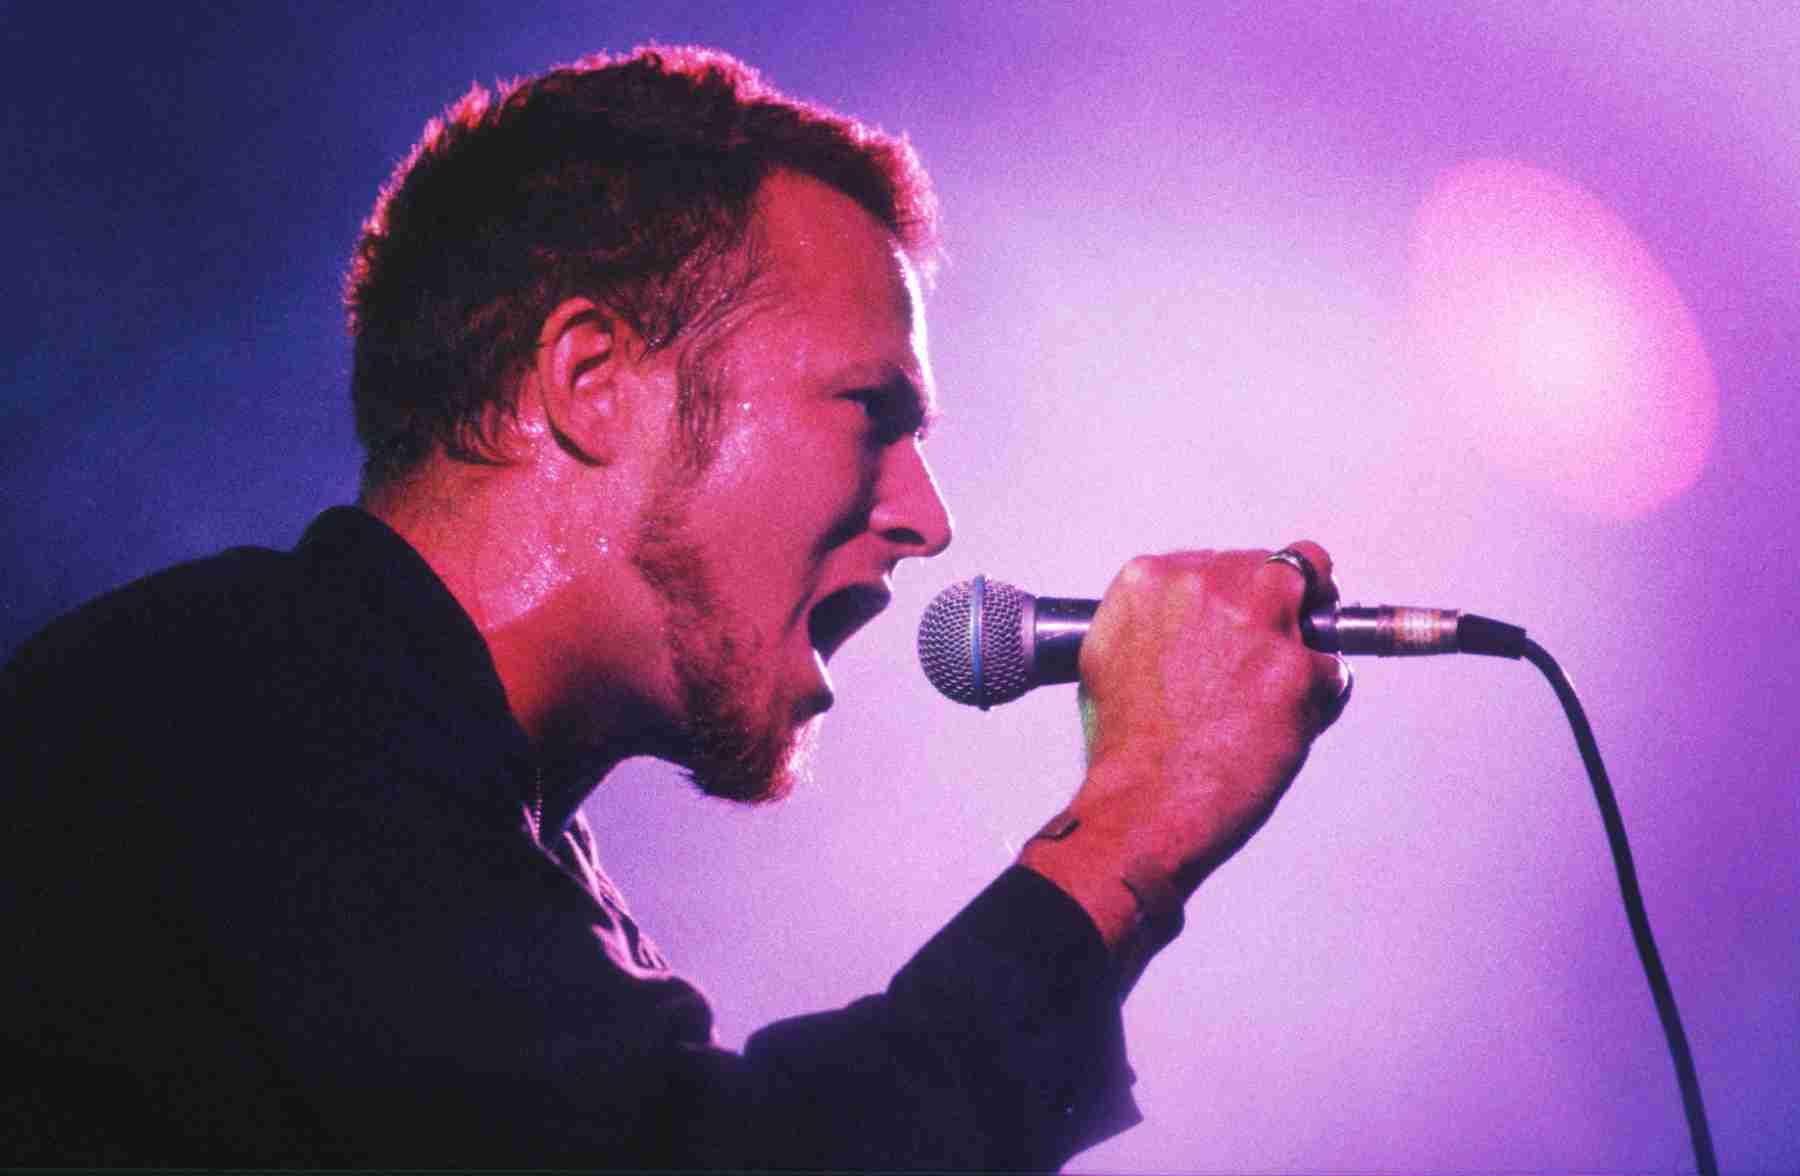 Ожизни бывшего фронтмена Stone Temple Pilots снимут байопик